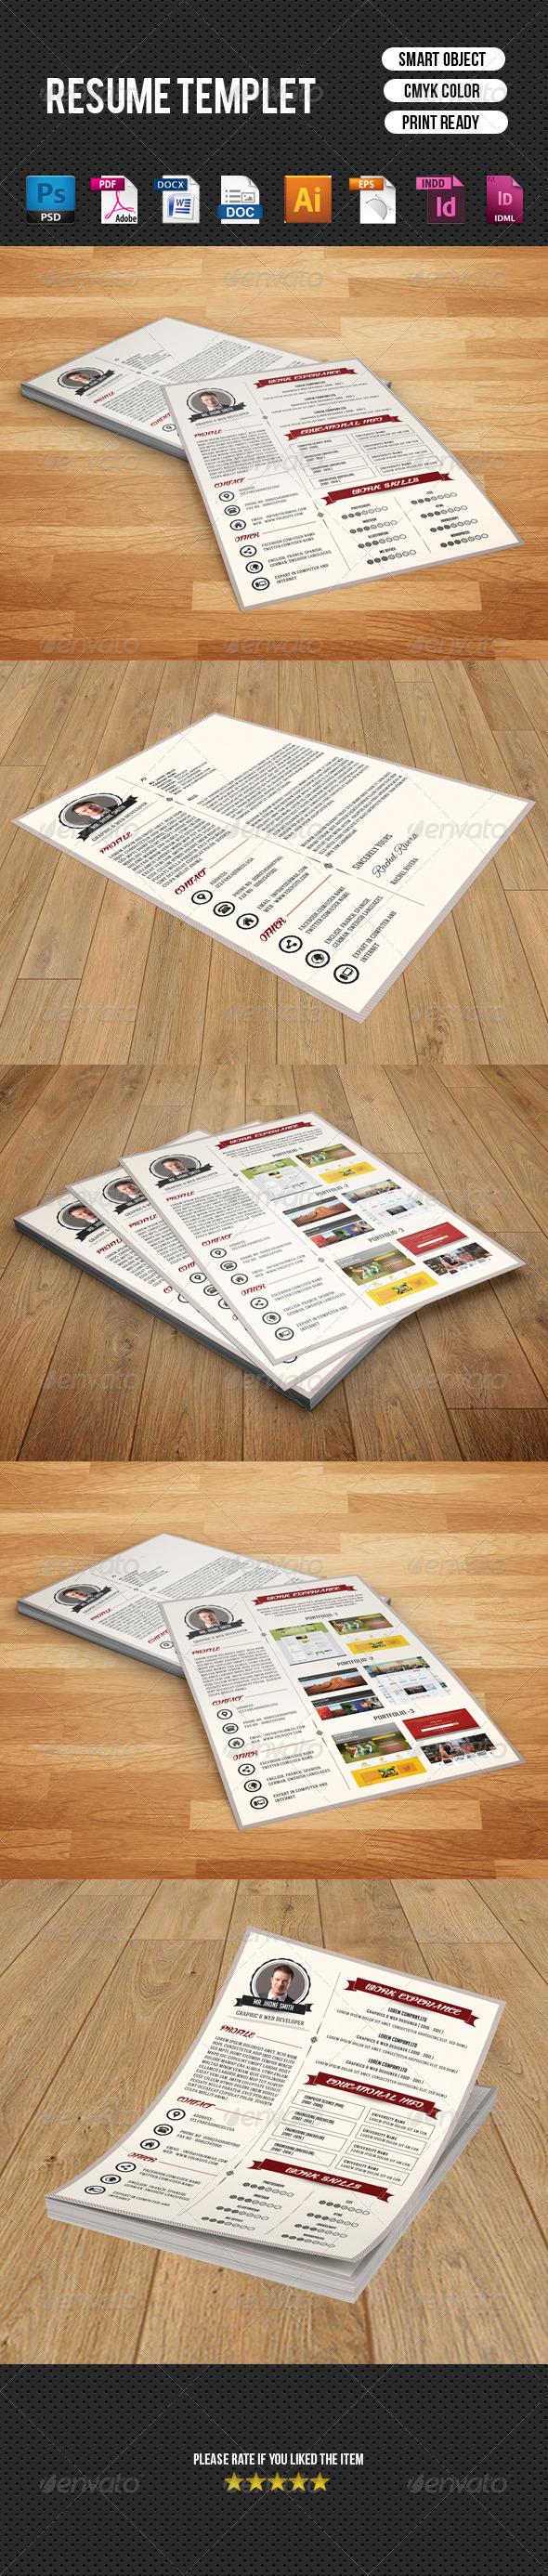 GraphicRiver Retro Vintage Resume CV V10 8680142